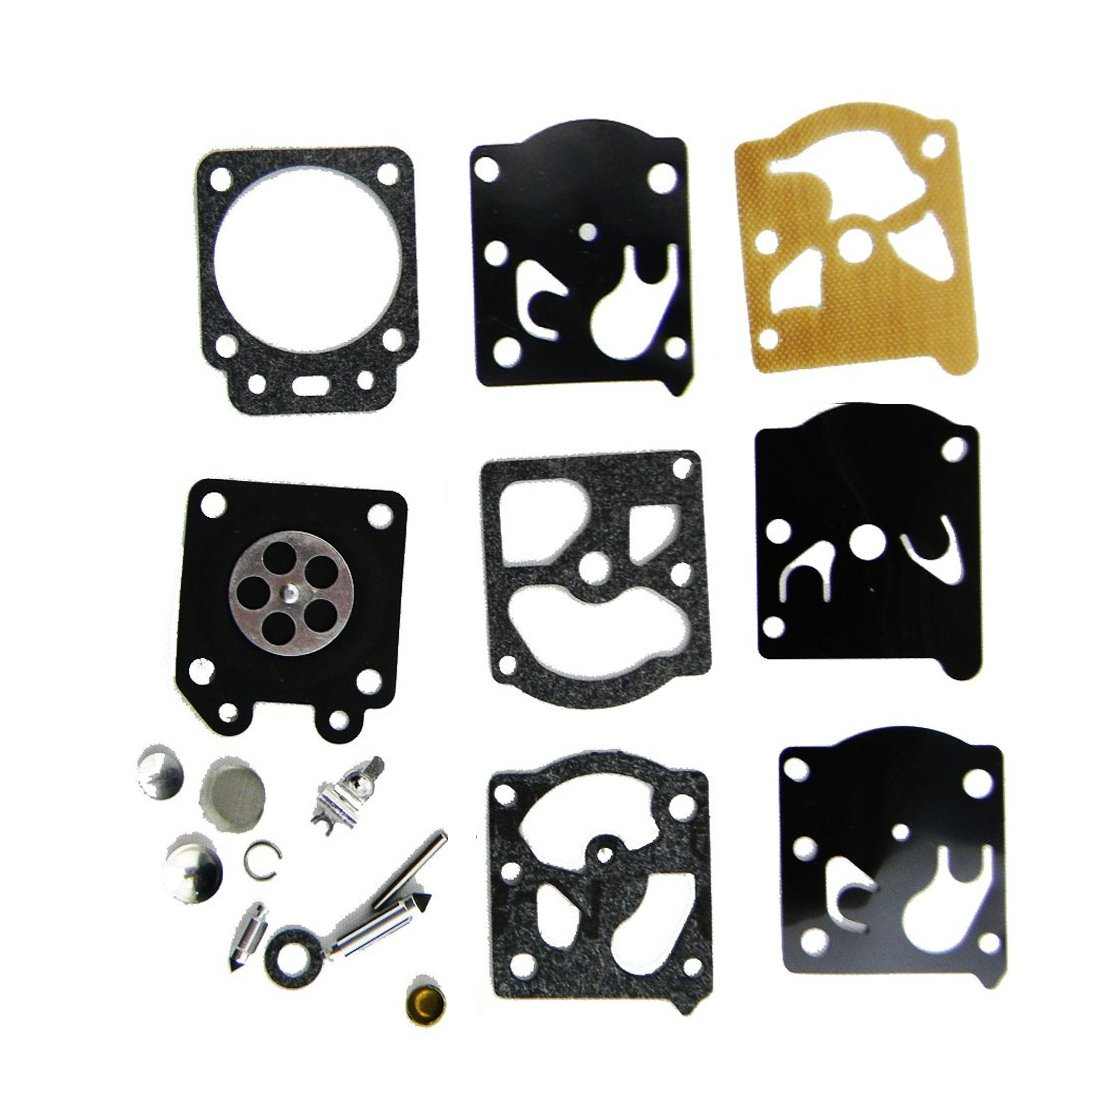 tucparts k24-wat Repair Seal Kit fü r Walbro Vergaser wt-274 wt-424 wt-592 wt-620 wt-621 wt-626 wt-630 wt-631 wt-640 wt-643 wt-644 wt-645 wt-646 wt-647 wt-648 wt